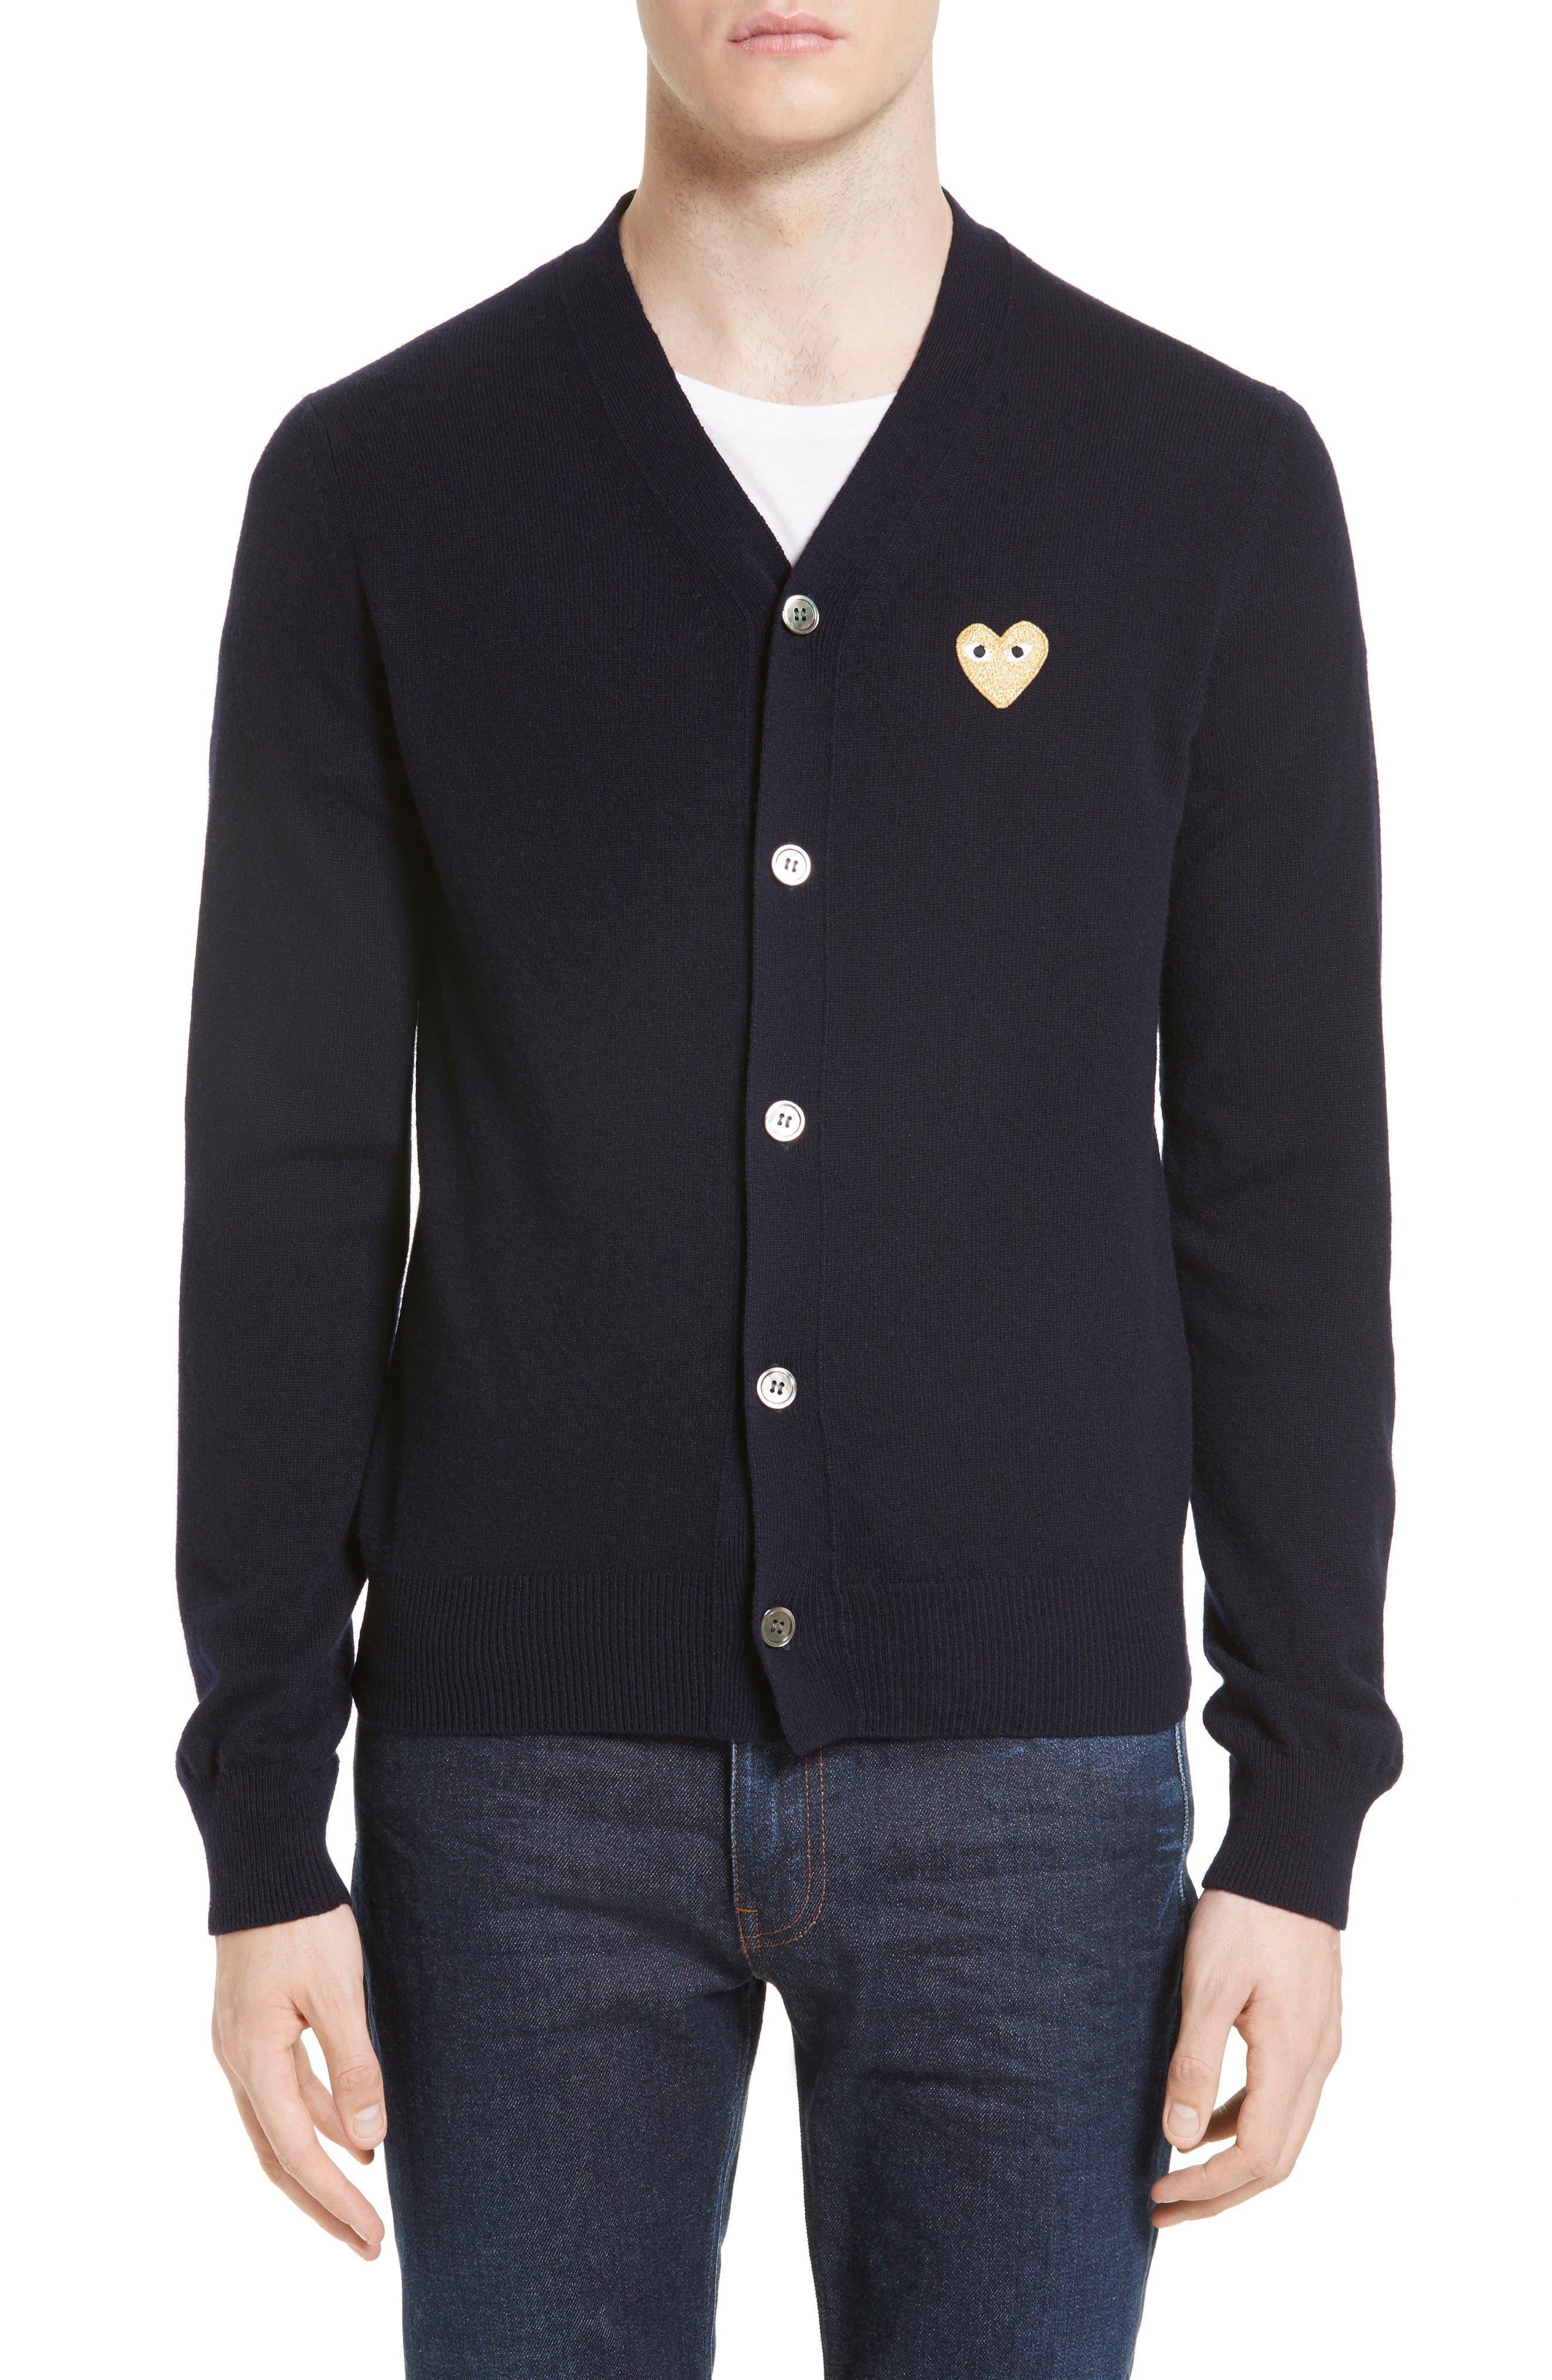 Sweater for Men Jumper On Sale, Black, Wool, 2017, L S XL Comme Des Garçons